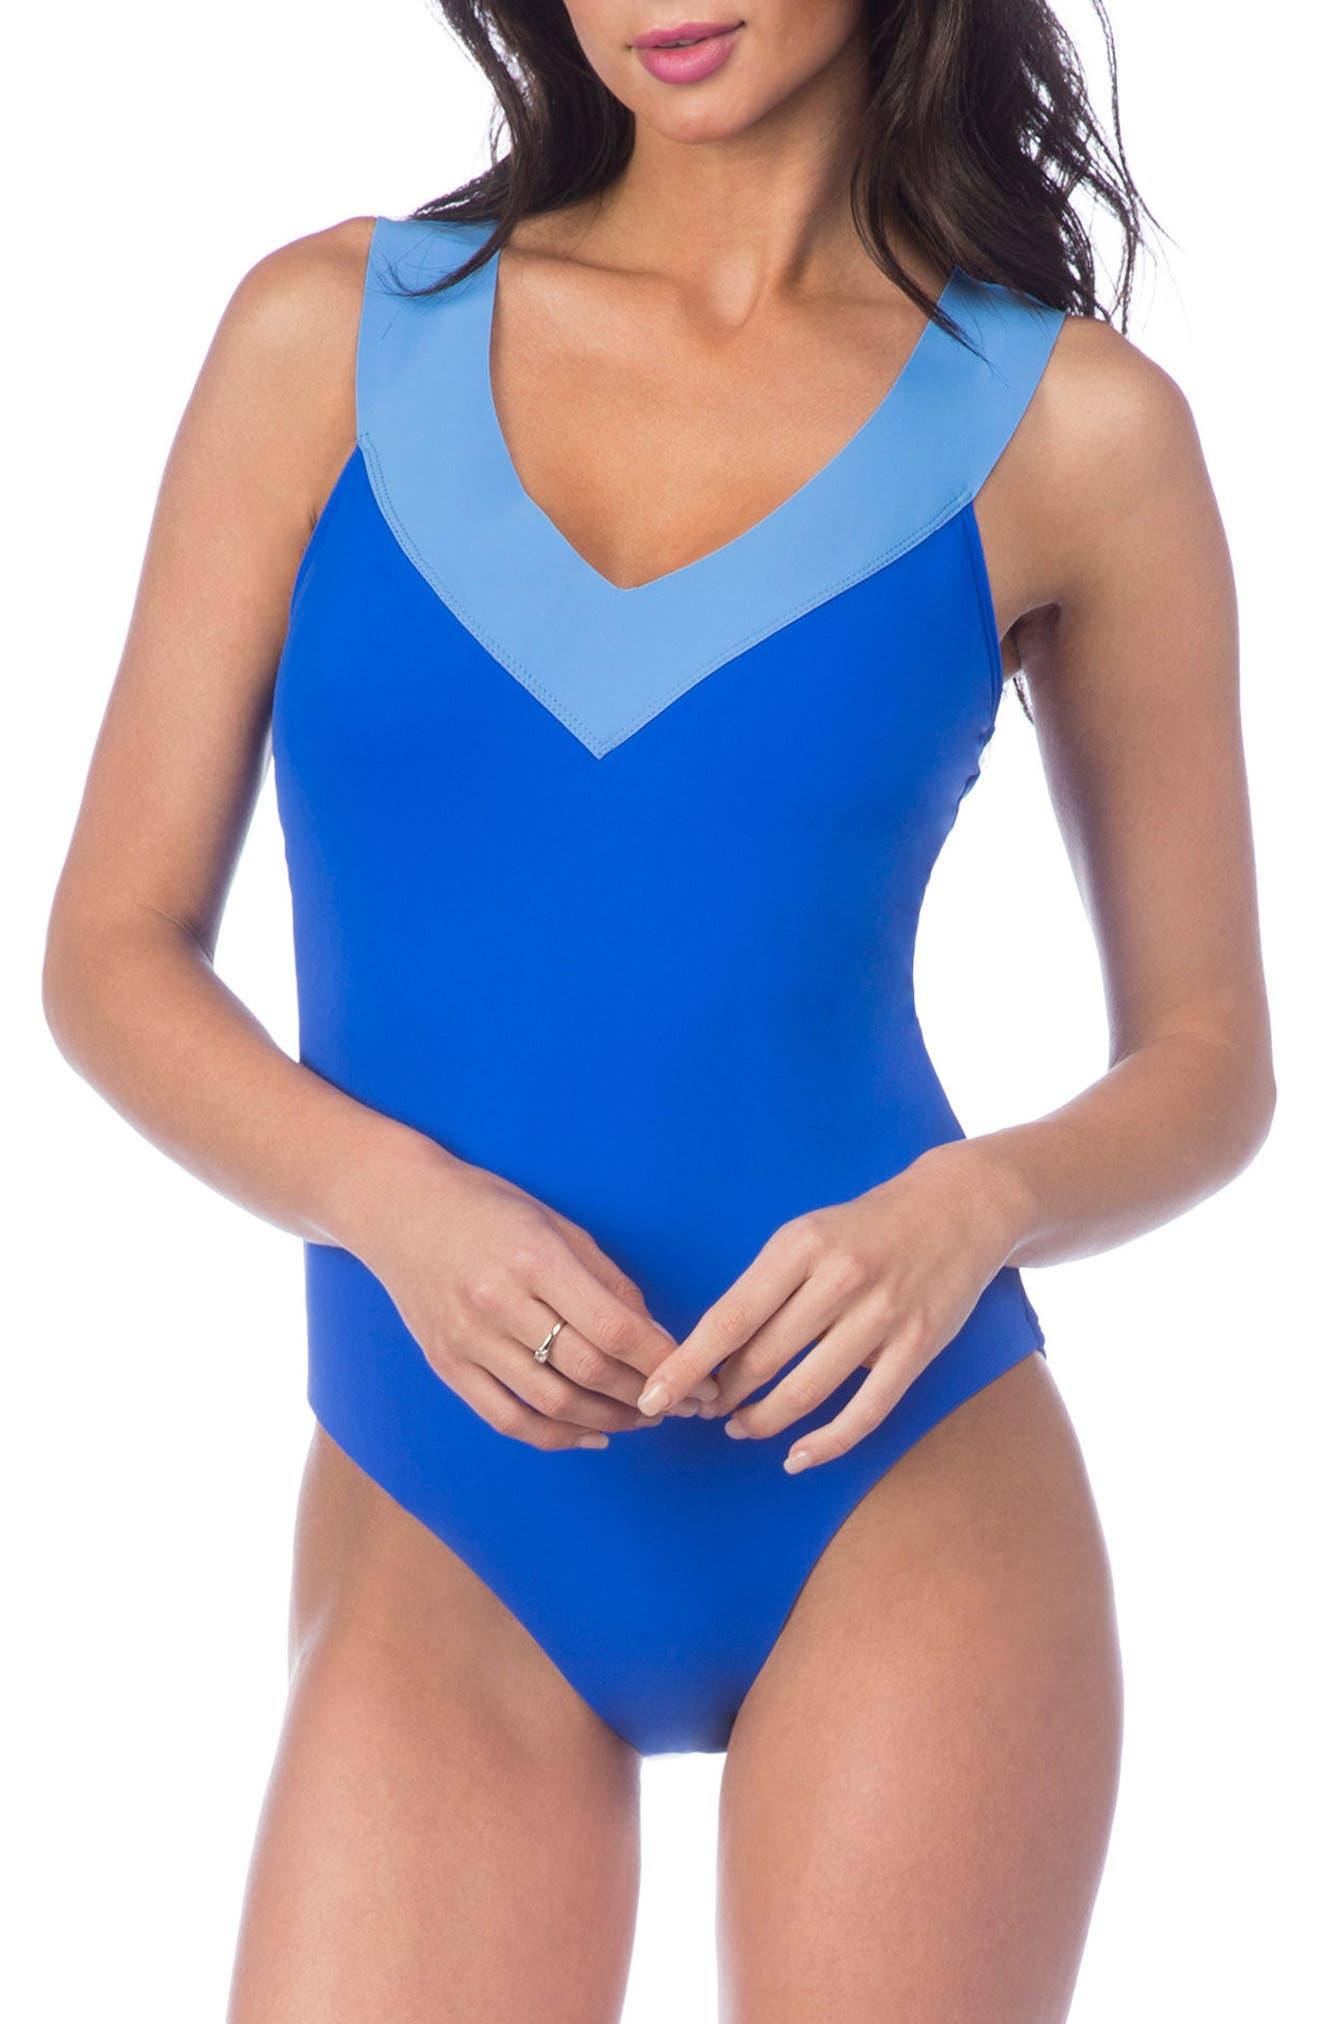 Bondage Cross Back Mio Convertible One-Piece Swimsuit,                         Main,                         color, Apollo Blue/ Blue Suede